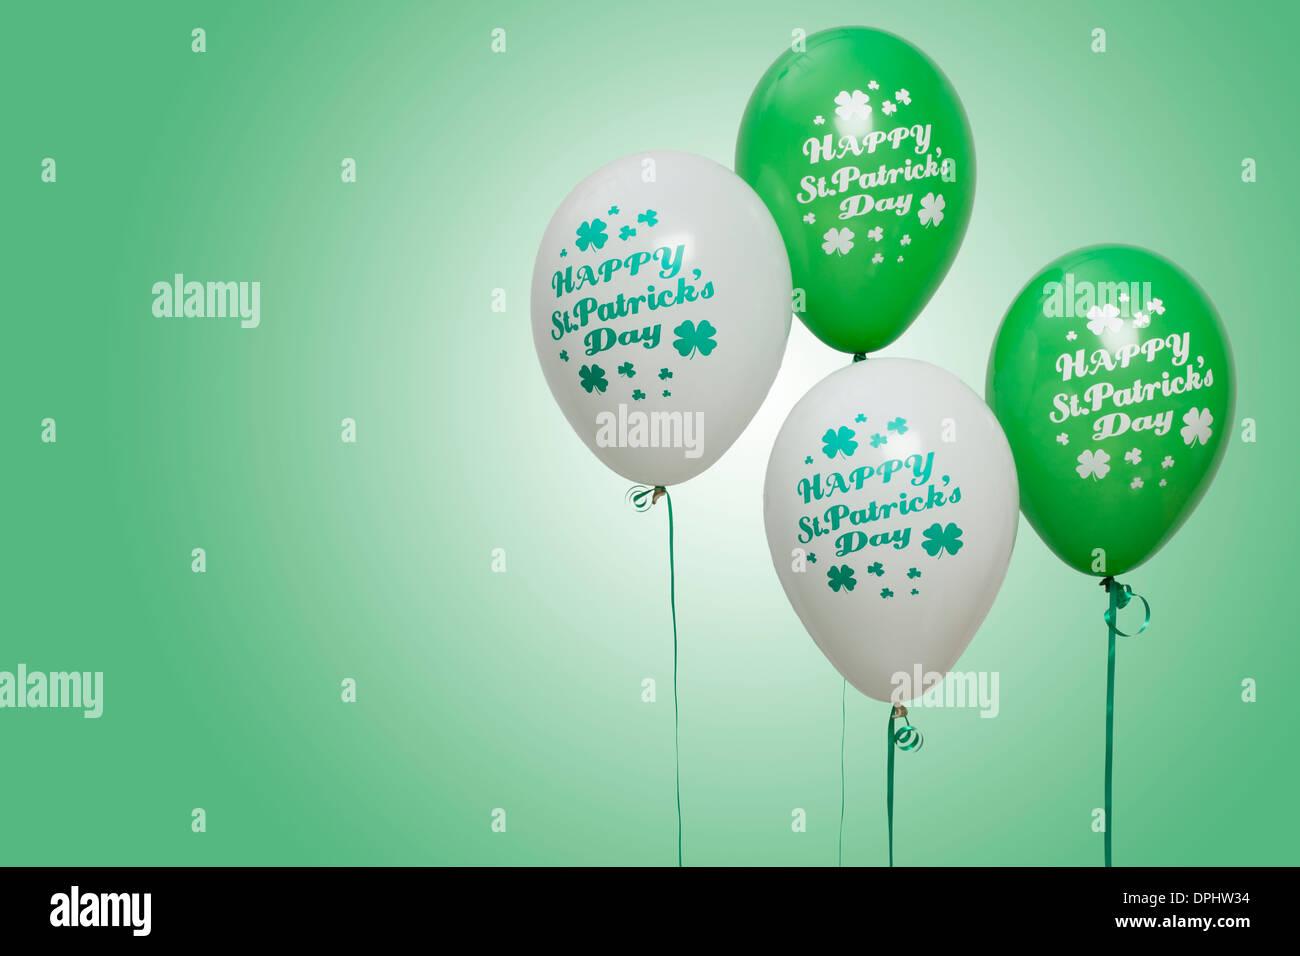 Balloons for celebrating St Patrick's Day - Stock Image